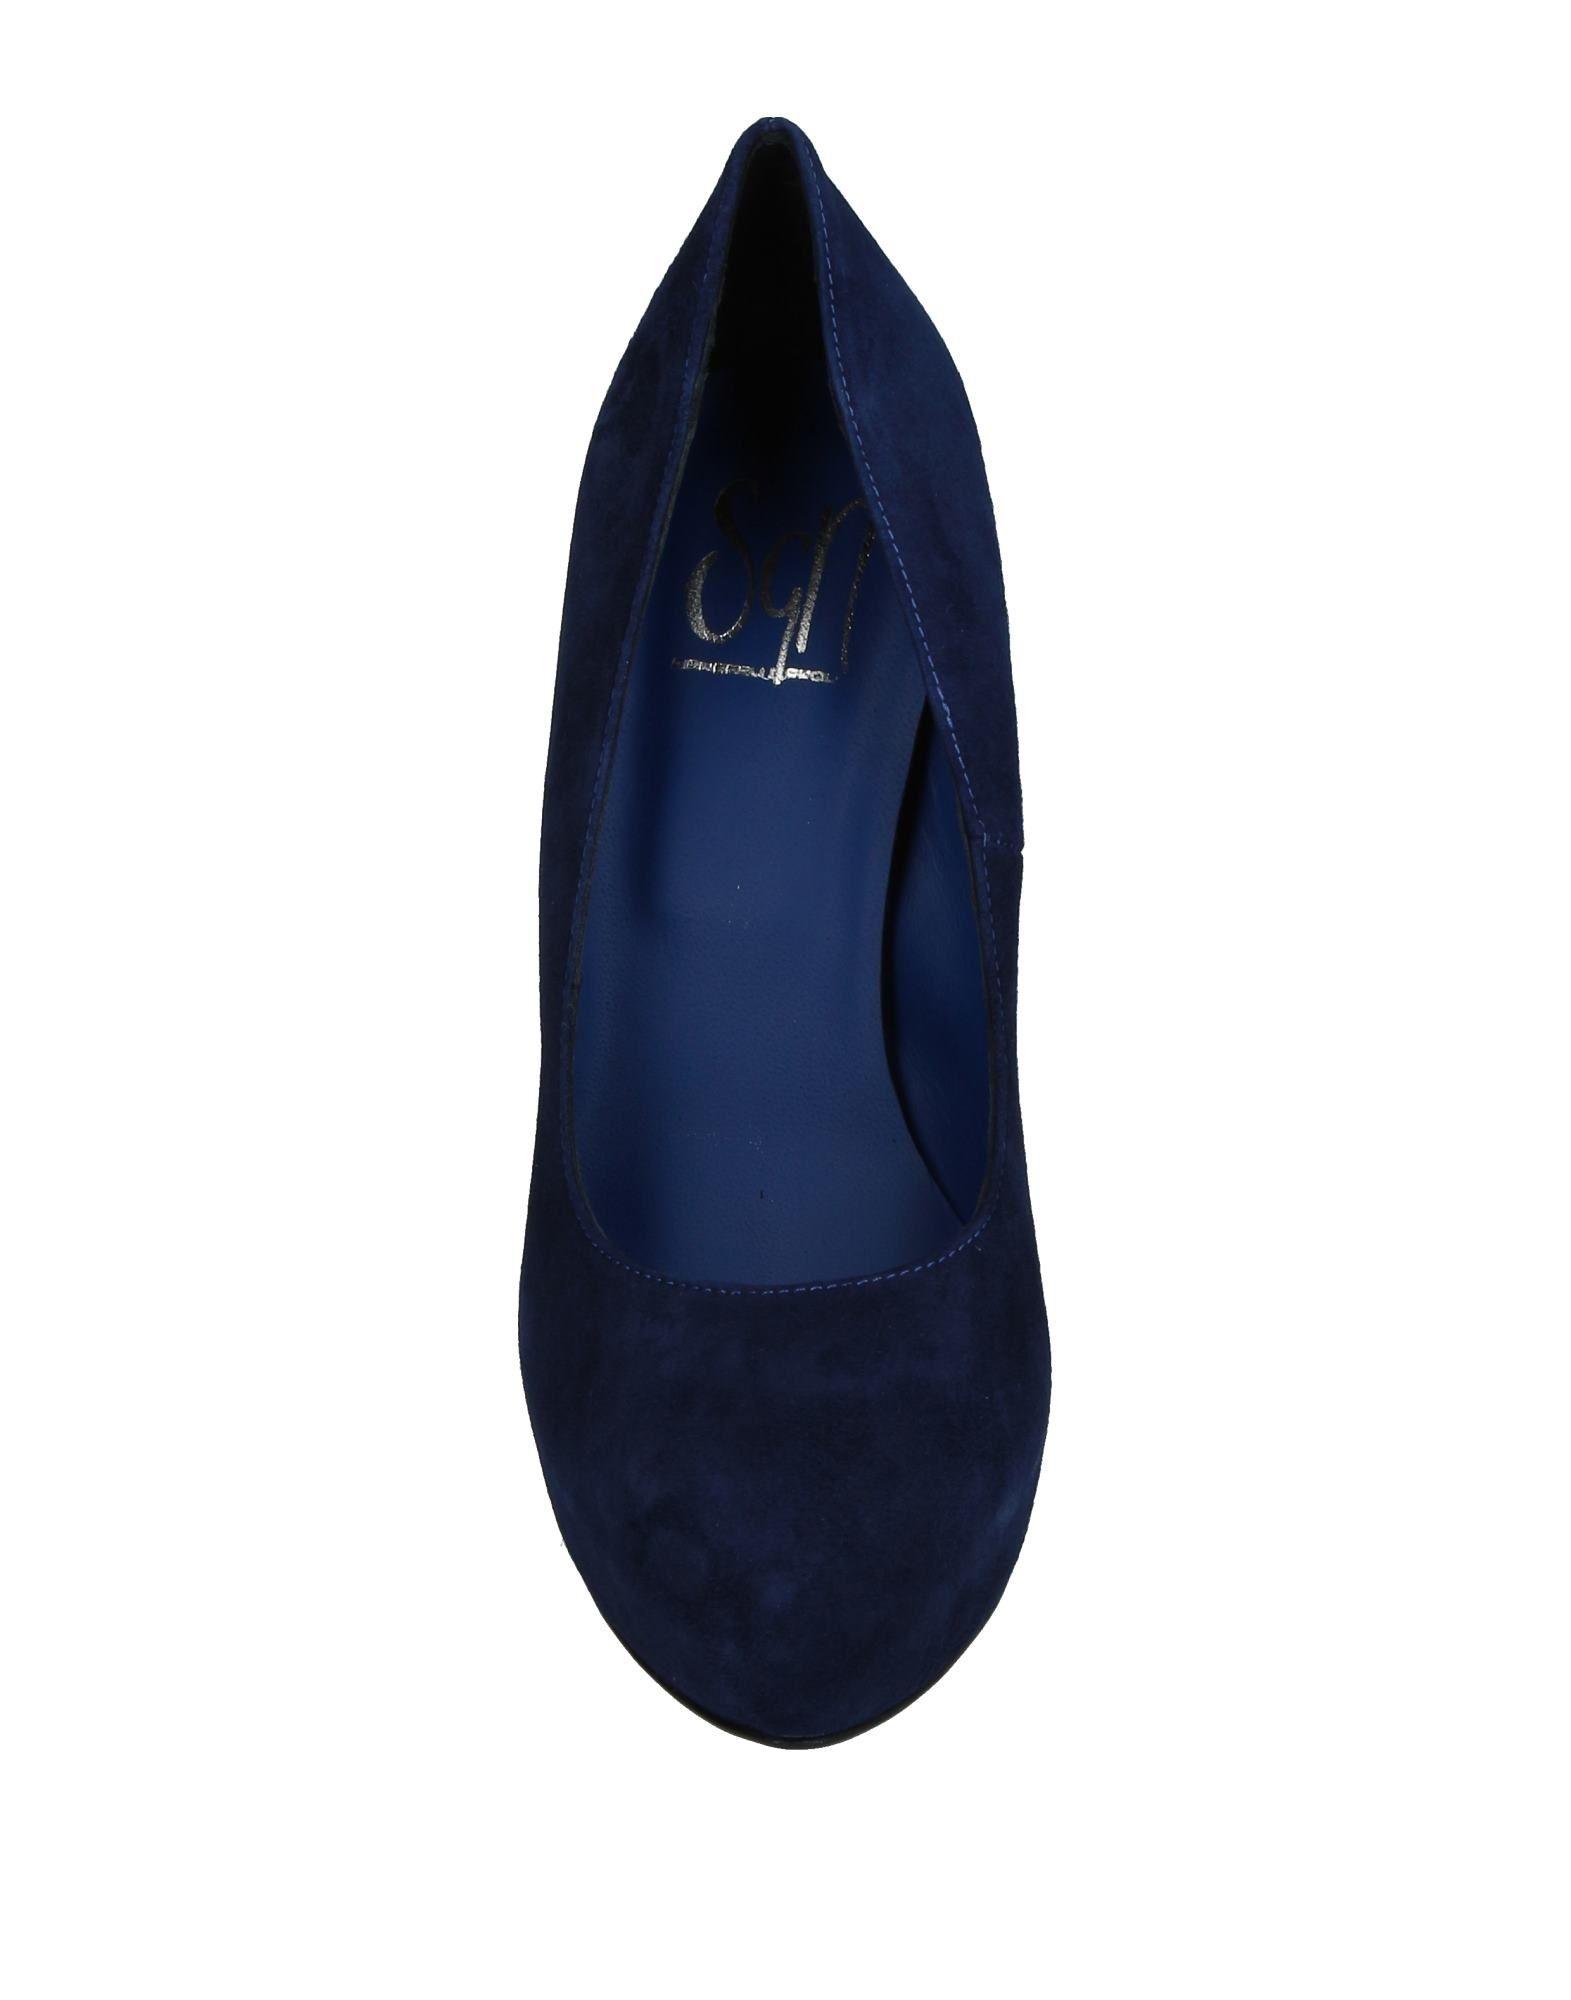 Sgn Giancarlo Paoli Pumps Qualität Damen  11236740BX Gute Qualität Pumps beliebte Schuhe 145c52